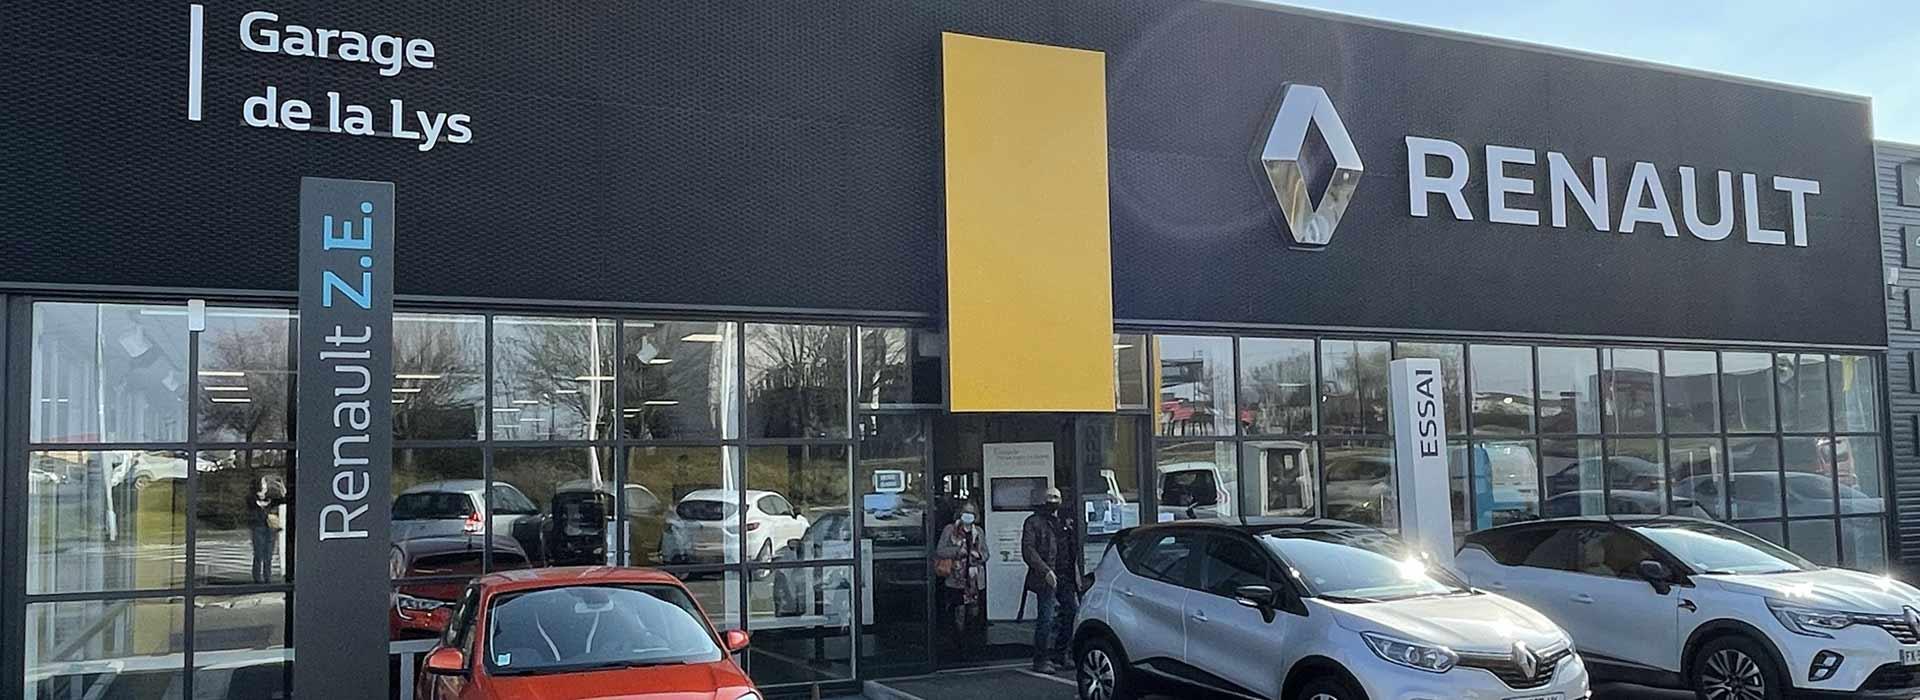 Renault englos concessionnaire garage nord 59 for Garage renault douai horaires